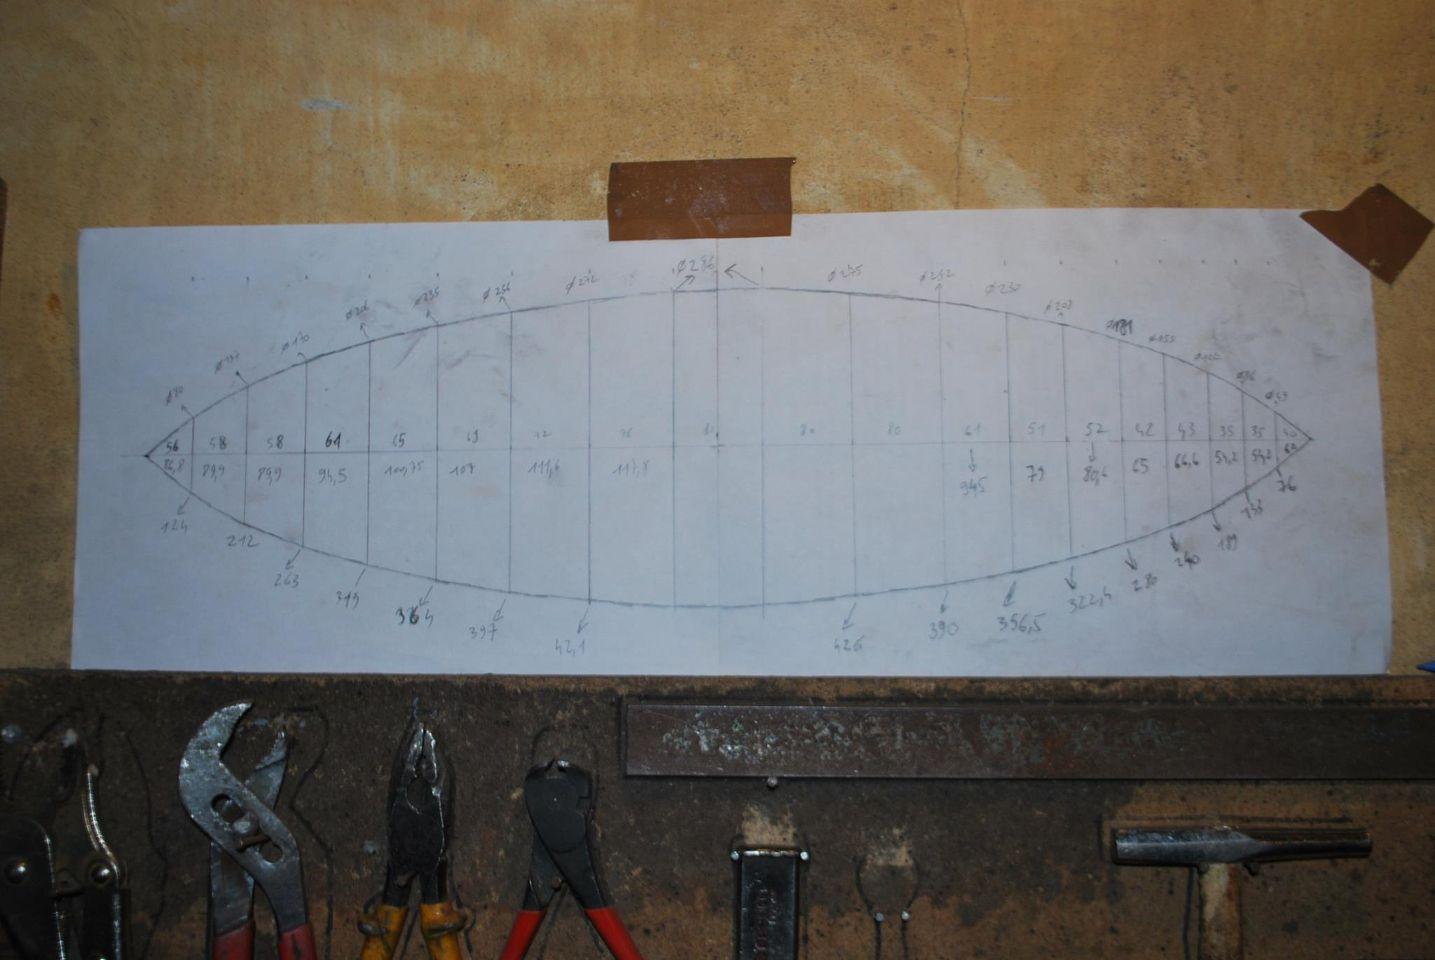 Felix-valdelievre-atelier-plan-de-calepinage-sculpture-2